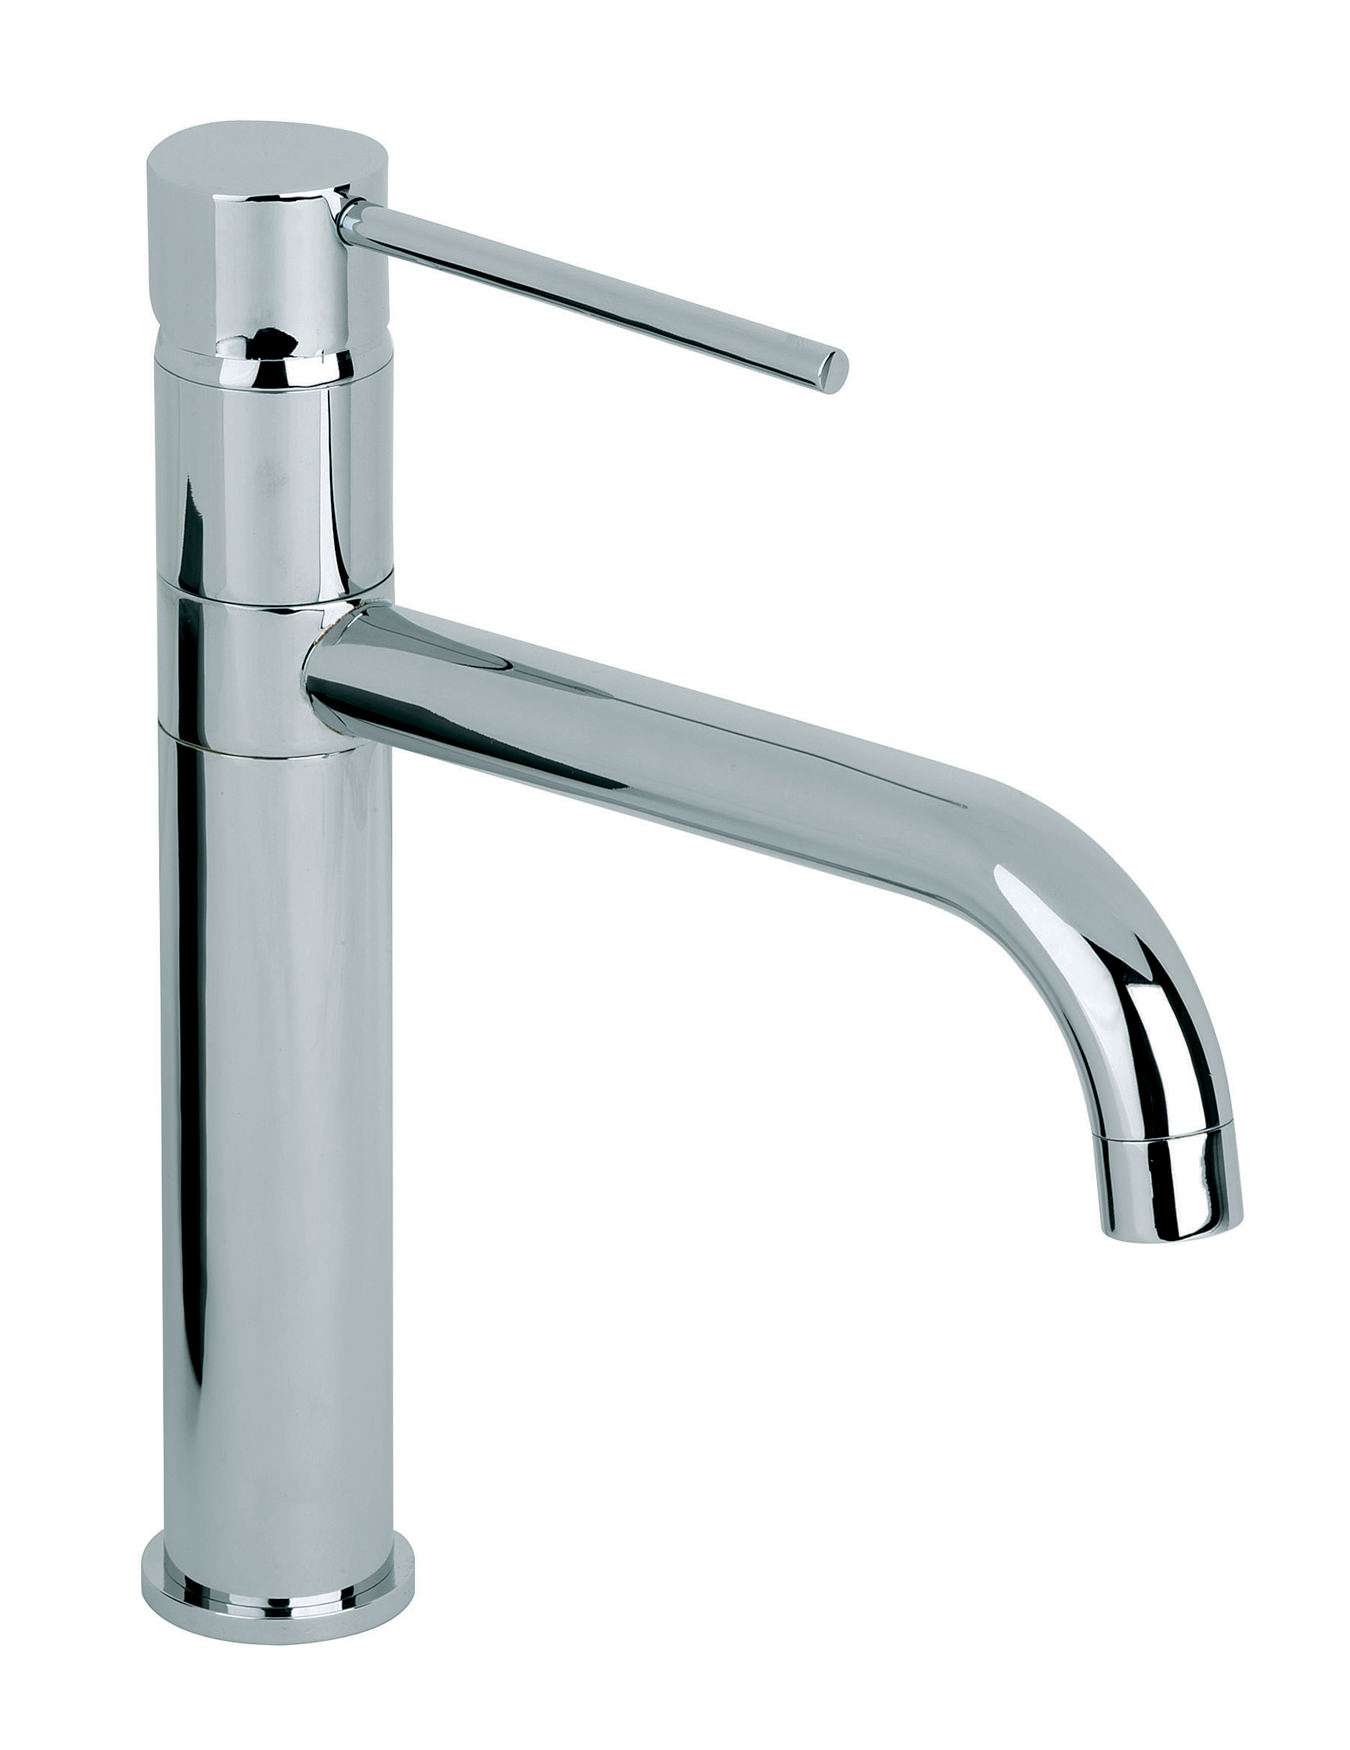 mayfair ascot monobloc kitchen sink mixer tap with swivel. Black Bedroom Furniture Sets. Home Design Ideas